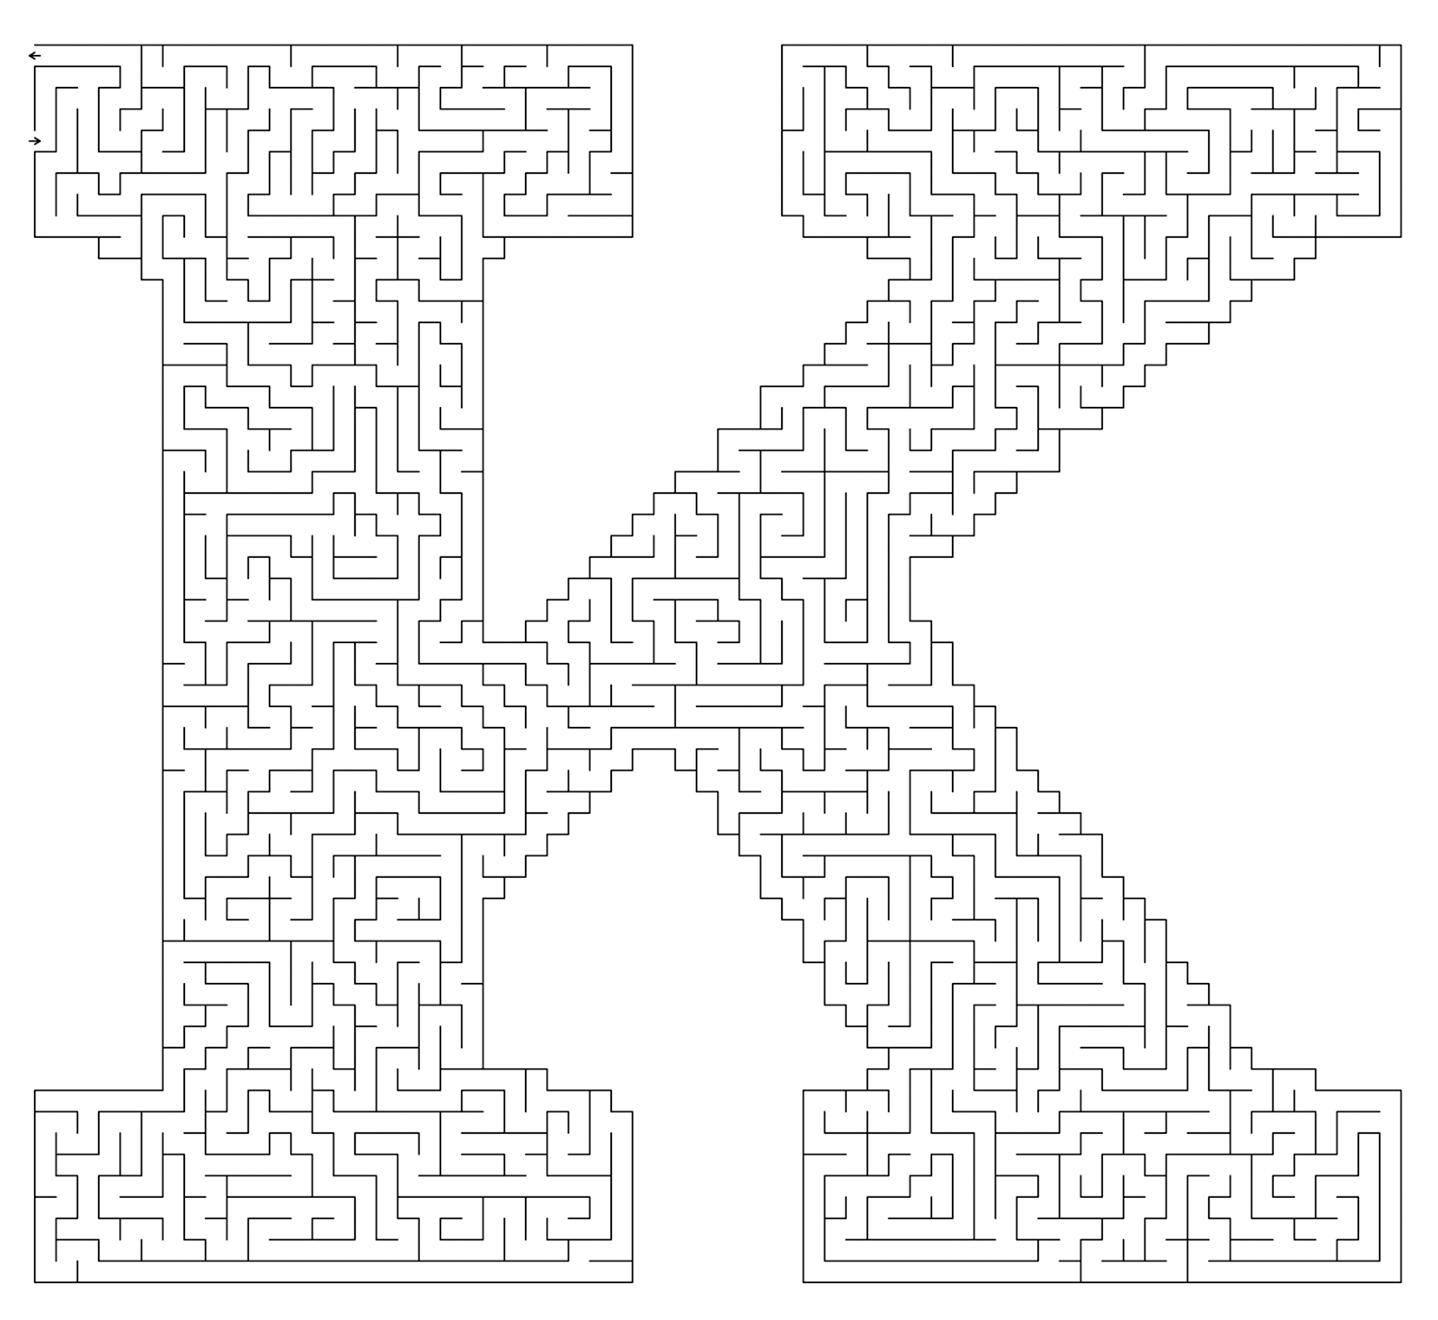 kmaze-1